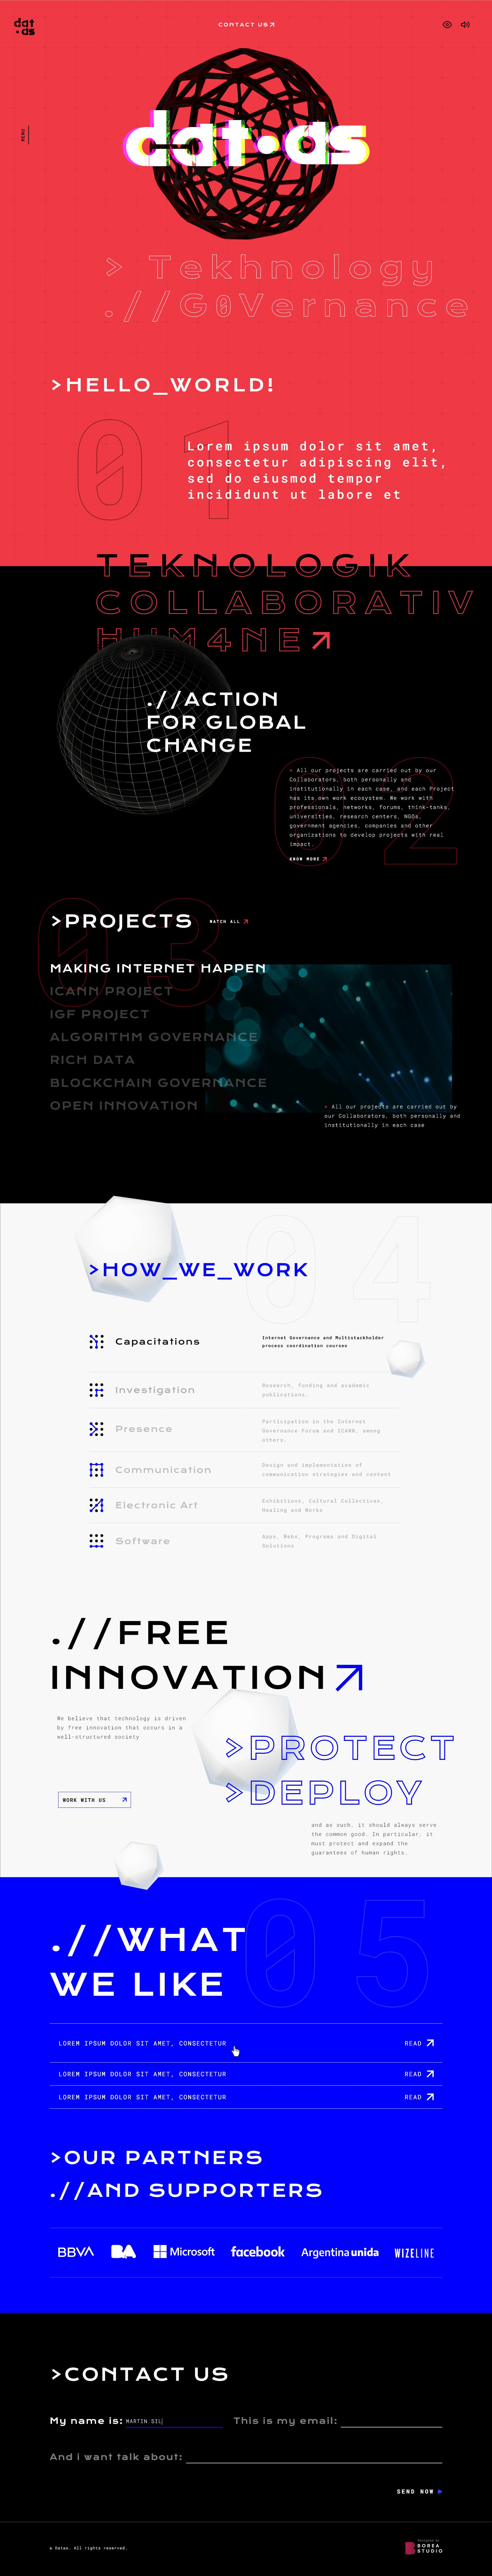 Datas's Website Design